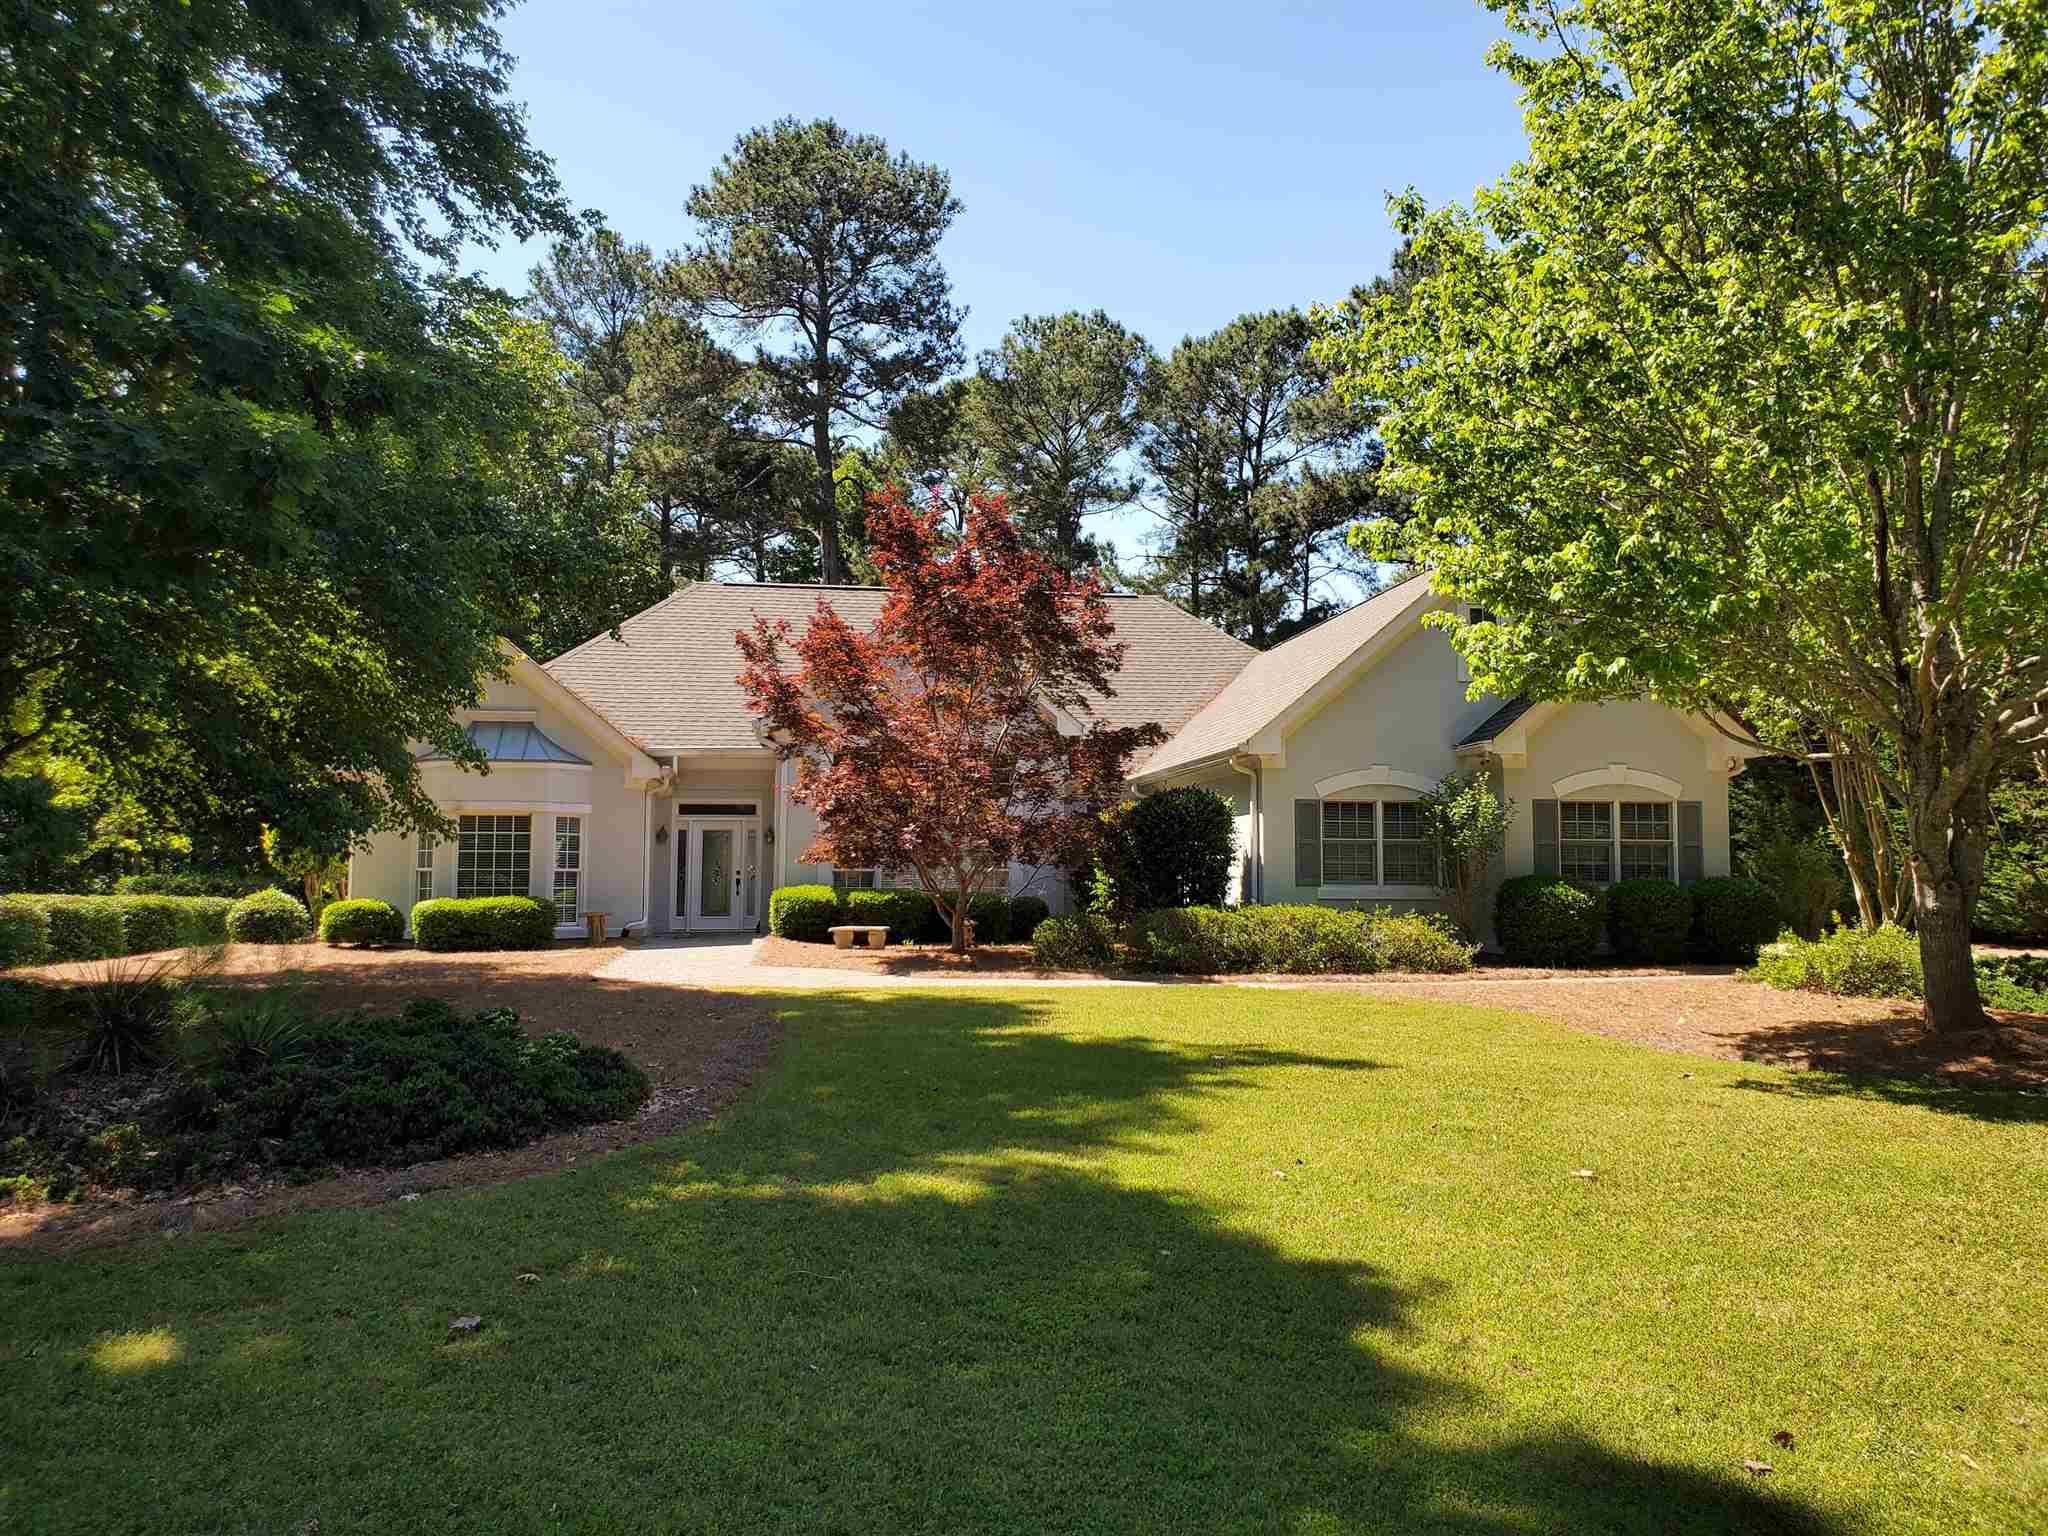 1861 GARNERS FERRY, Lake Oconee Reynolds Landing in Greene County, GA 30642 Home for Sale